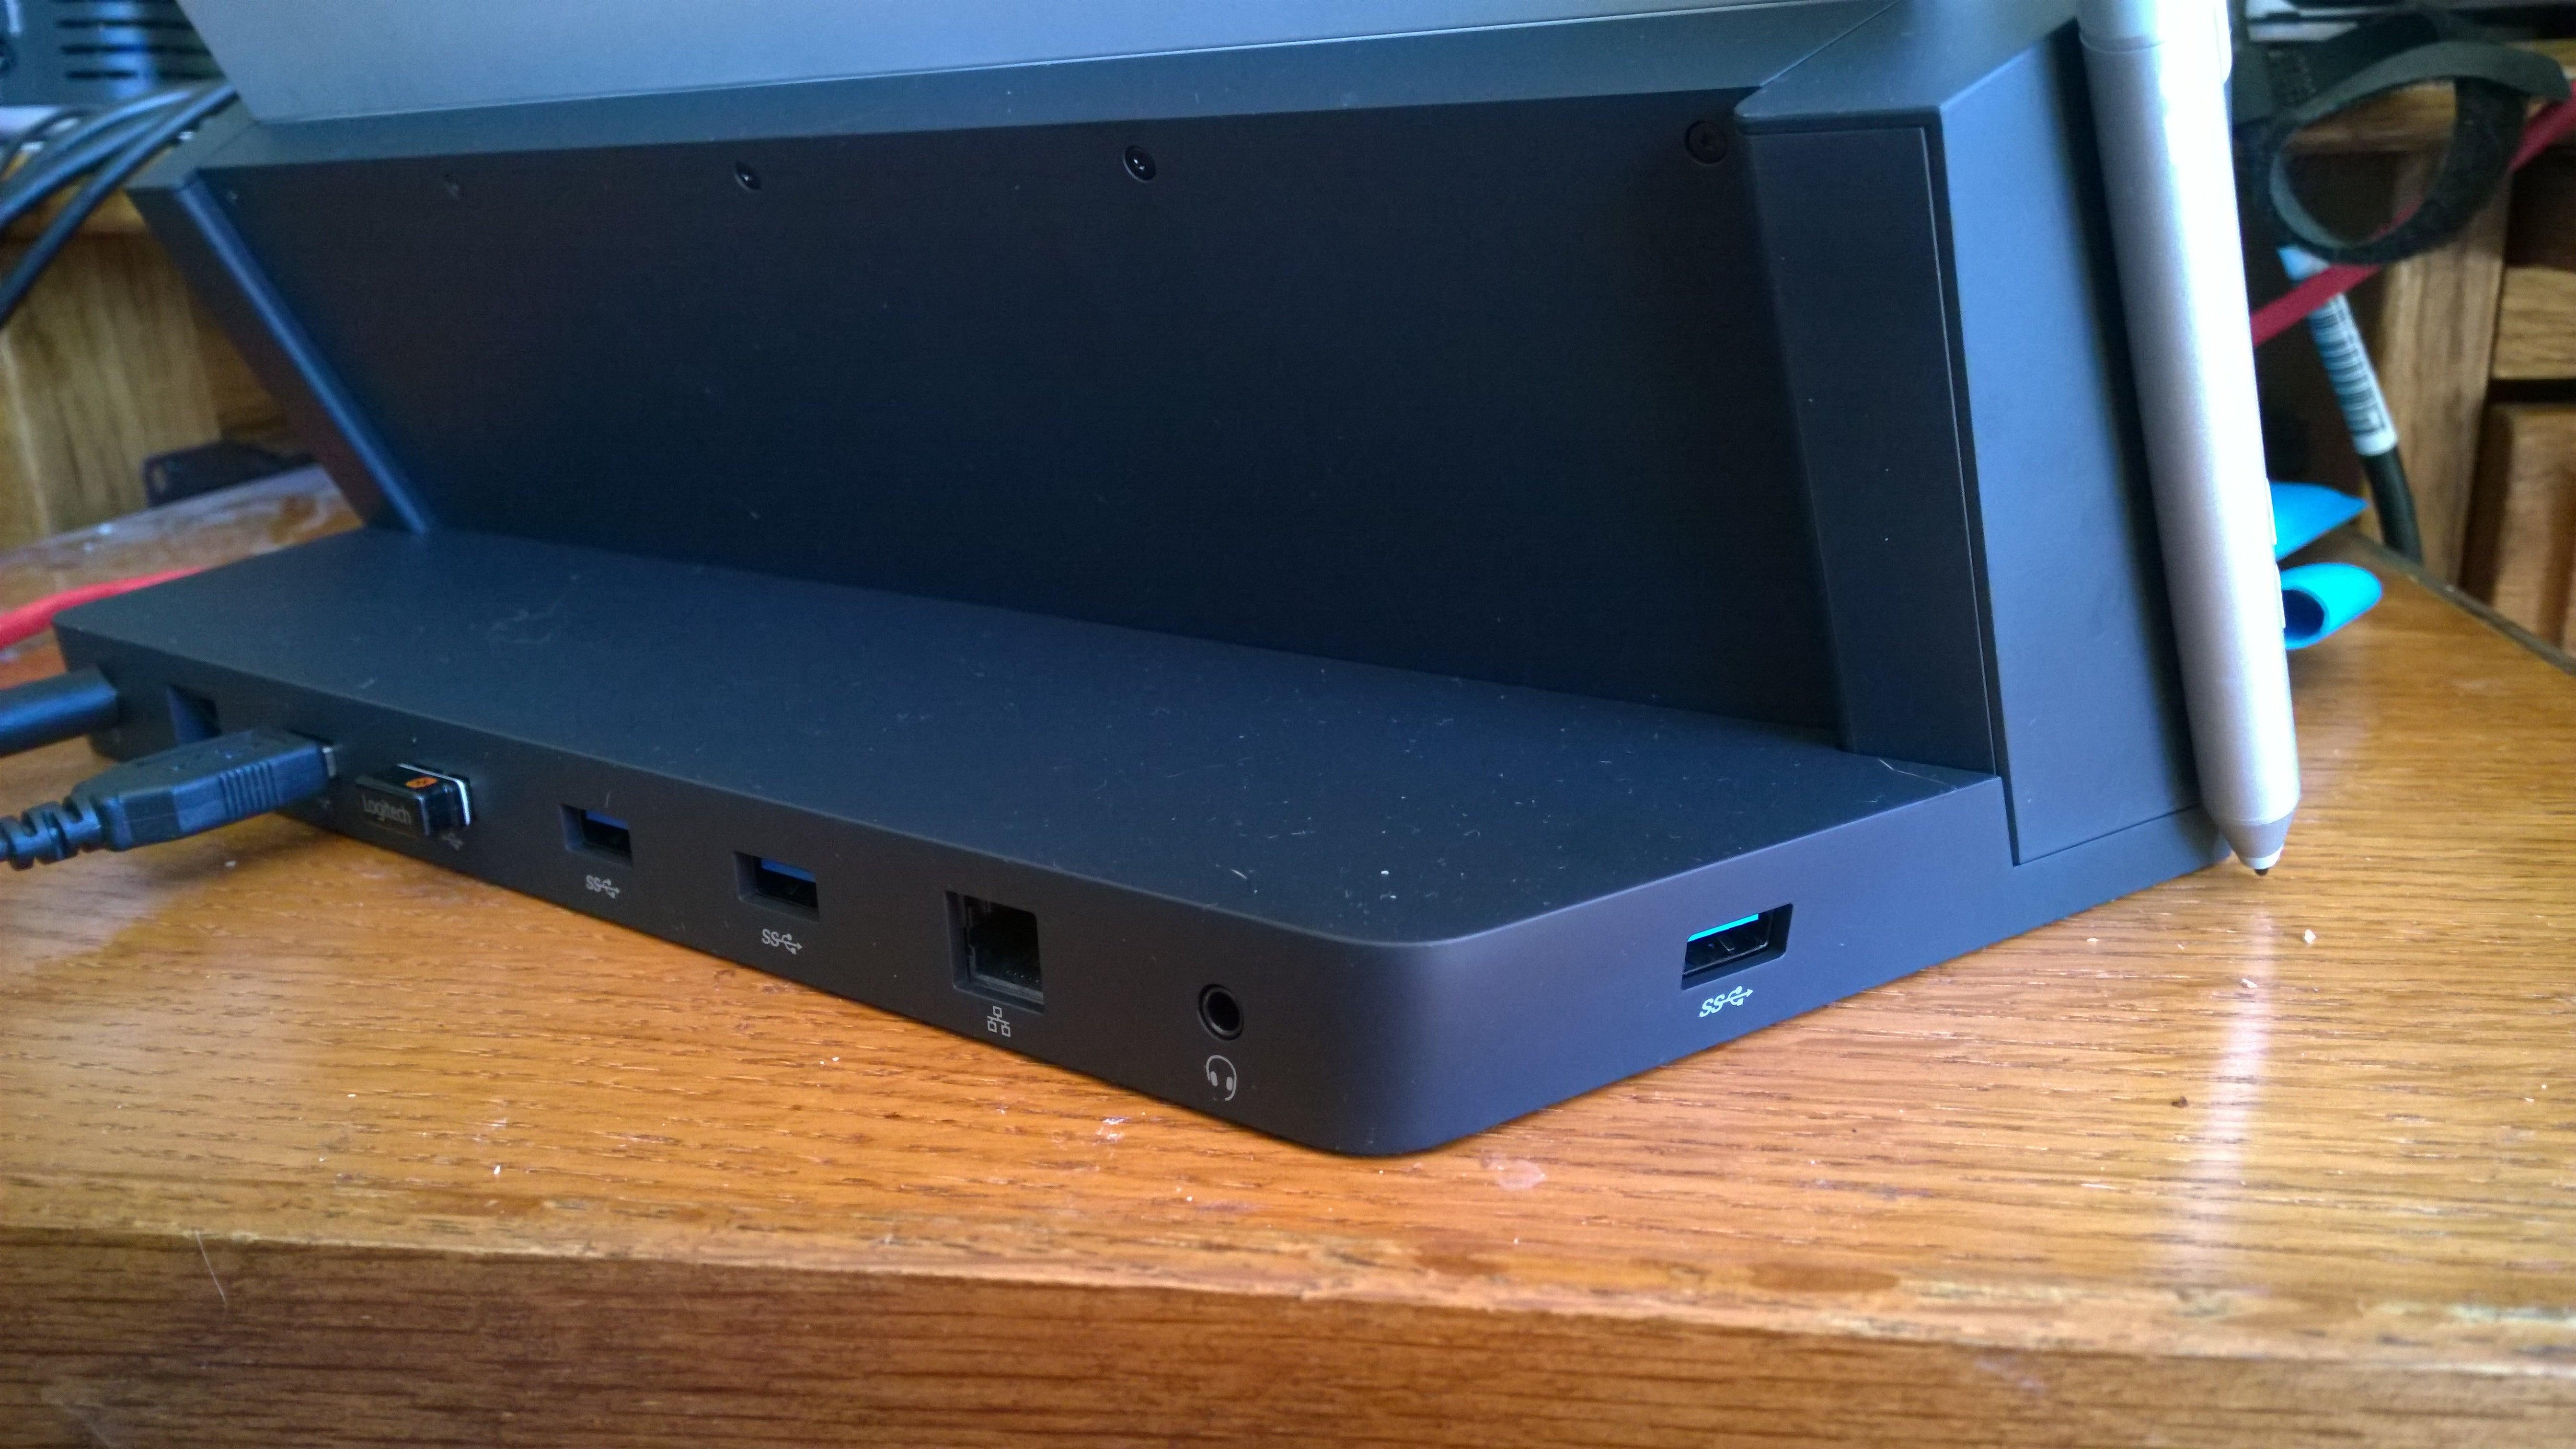 Microsoft surface pro 3 reviews - Microsoft Surface Pro 3 Docking Station